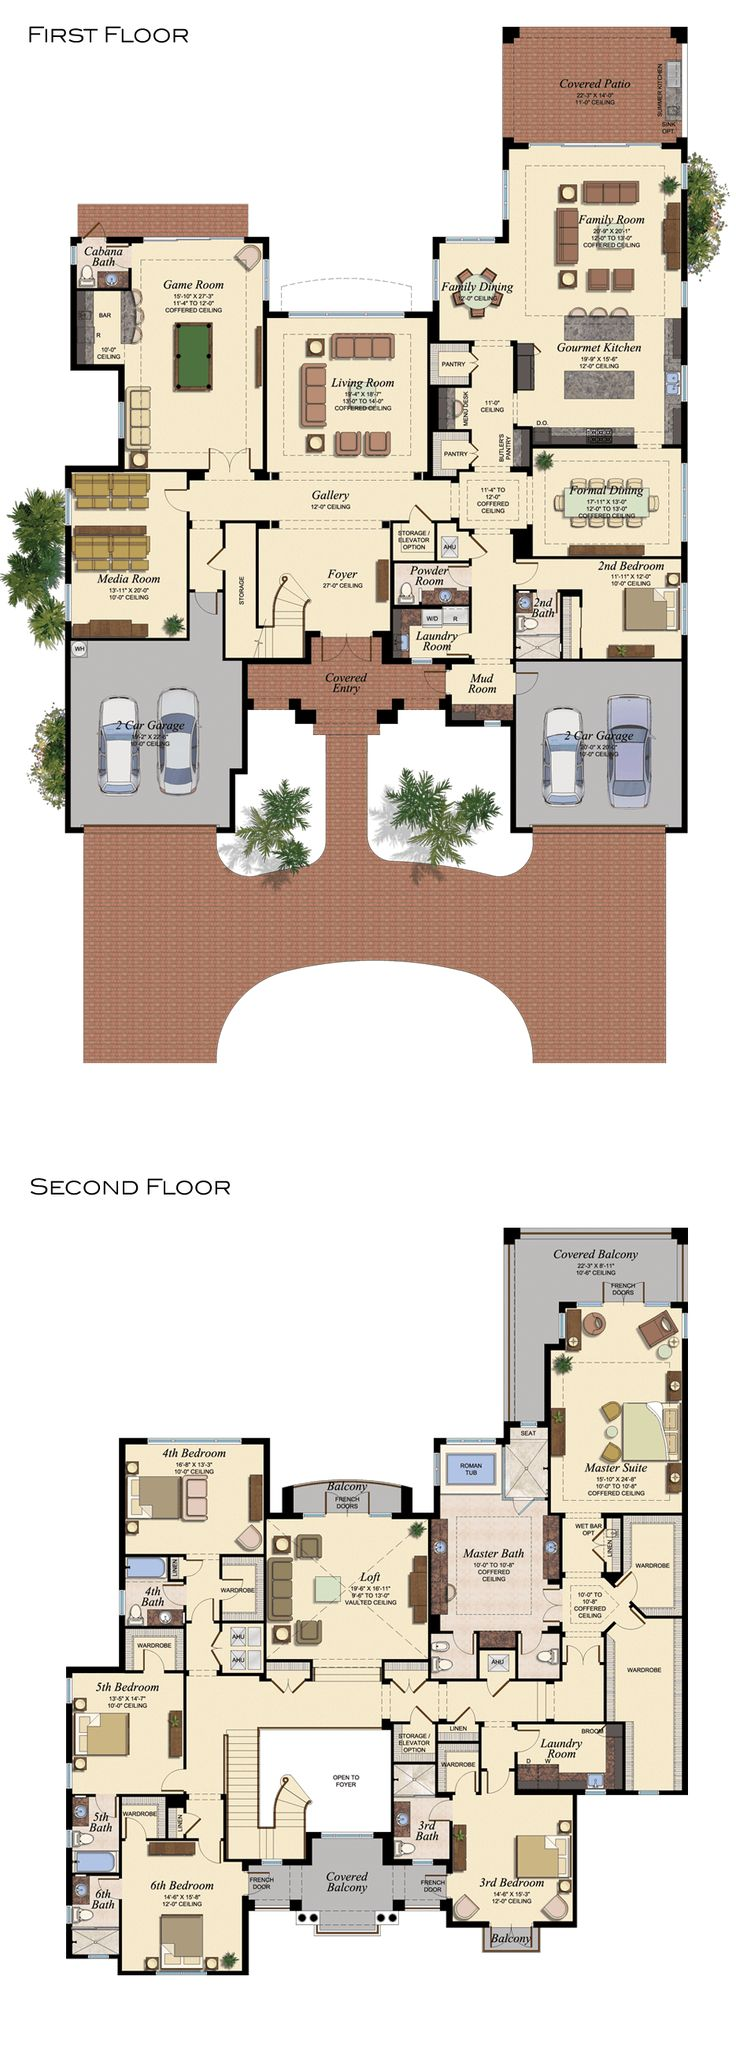 broker InteriorDesign RealEstate FL FloridaLiving NewHome